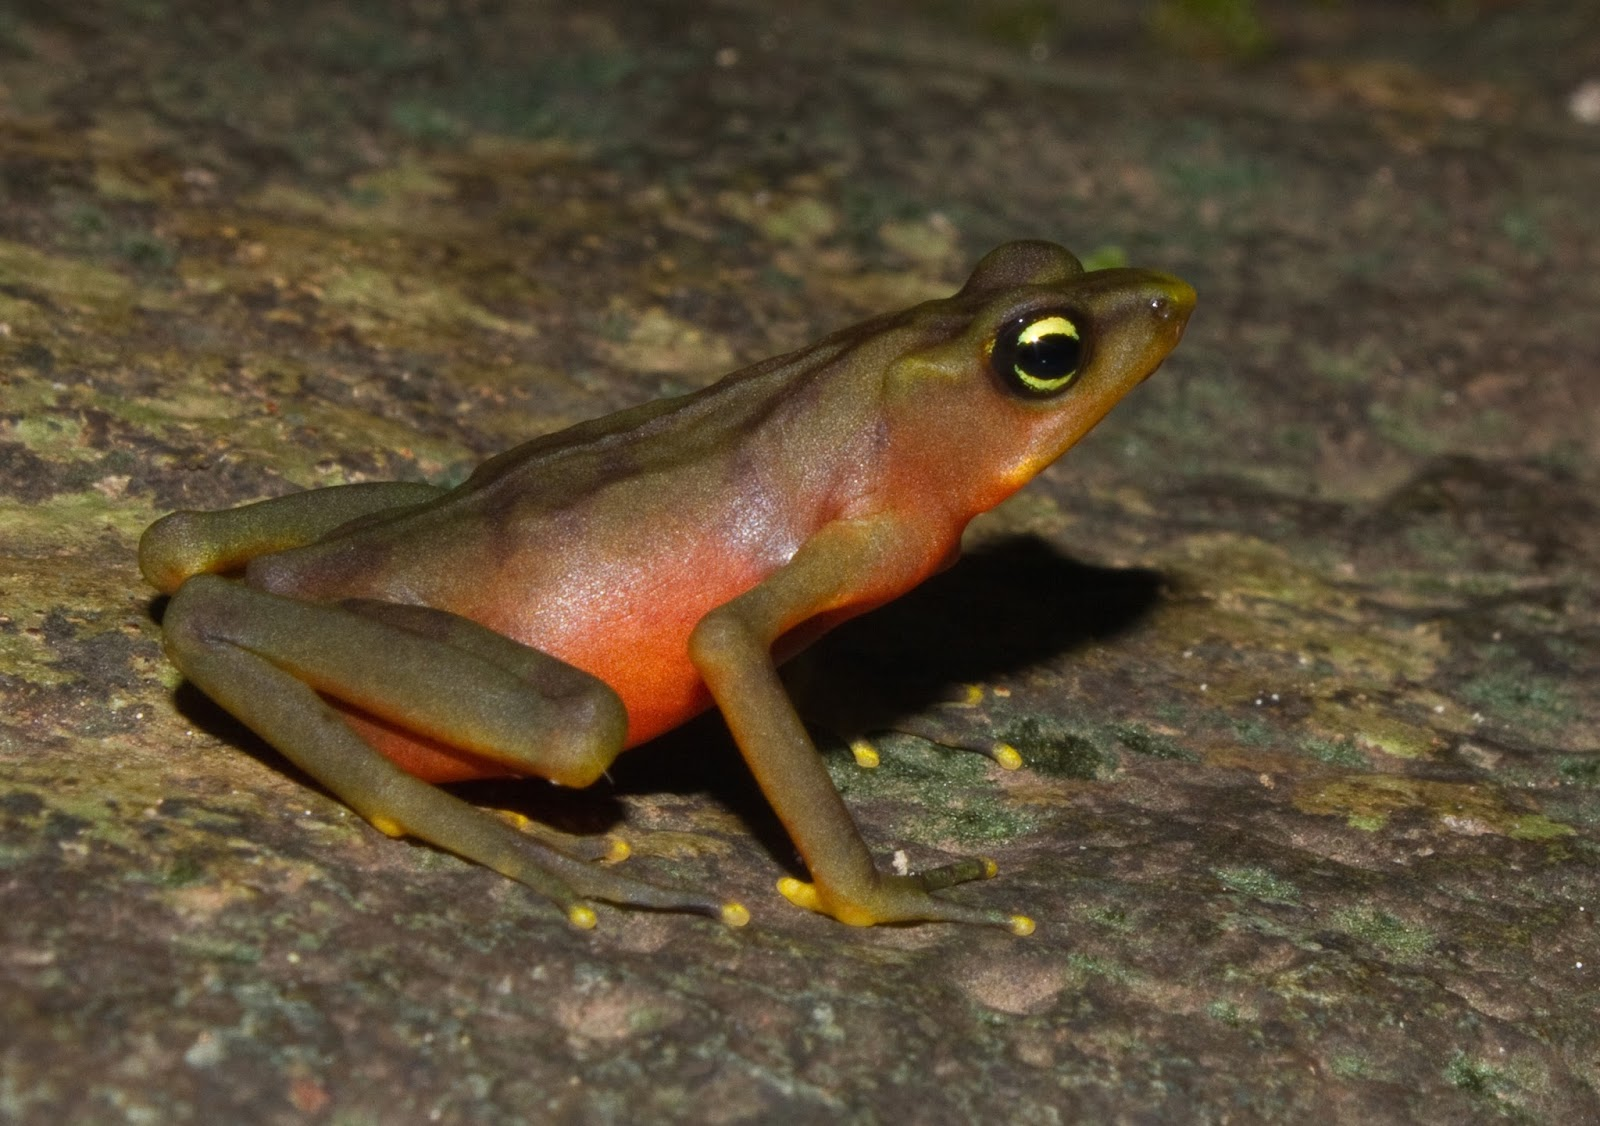 Amphibians: Atelopus limosus female